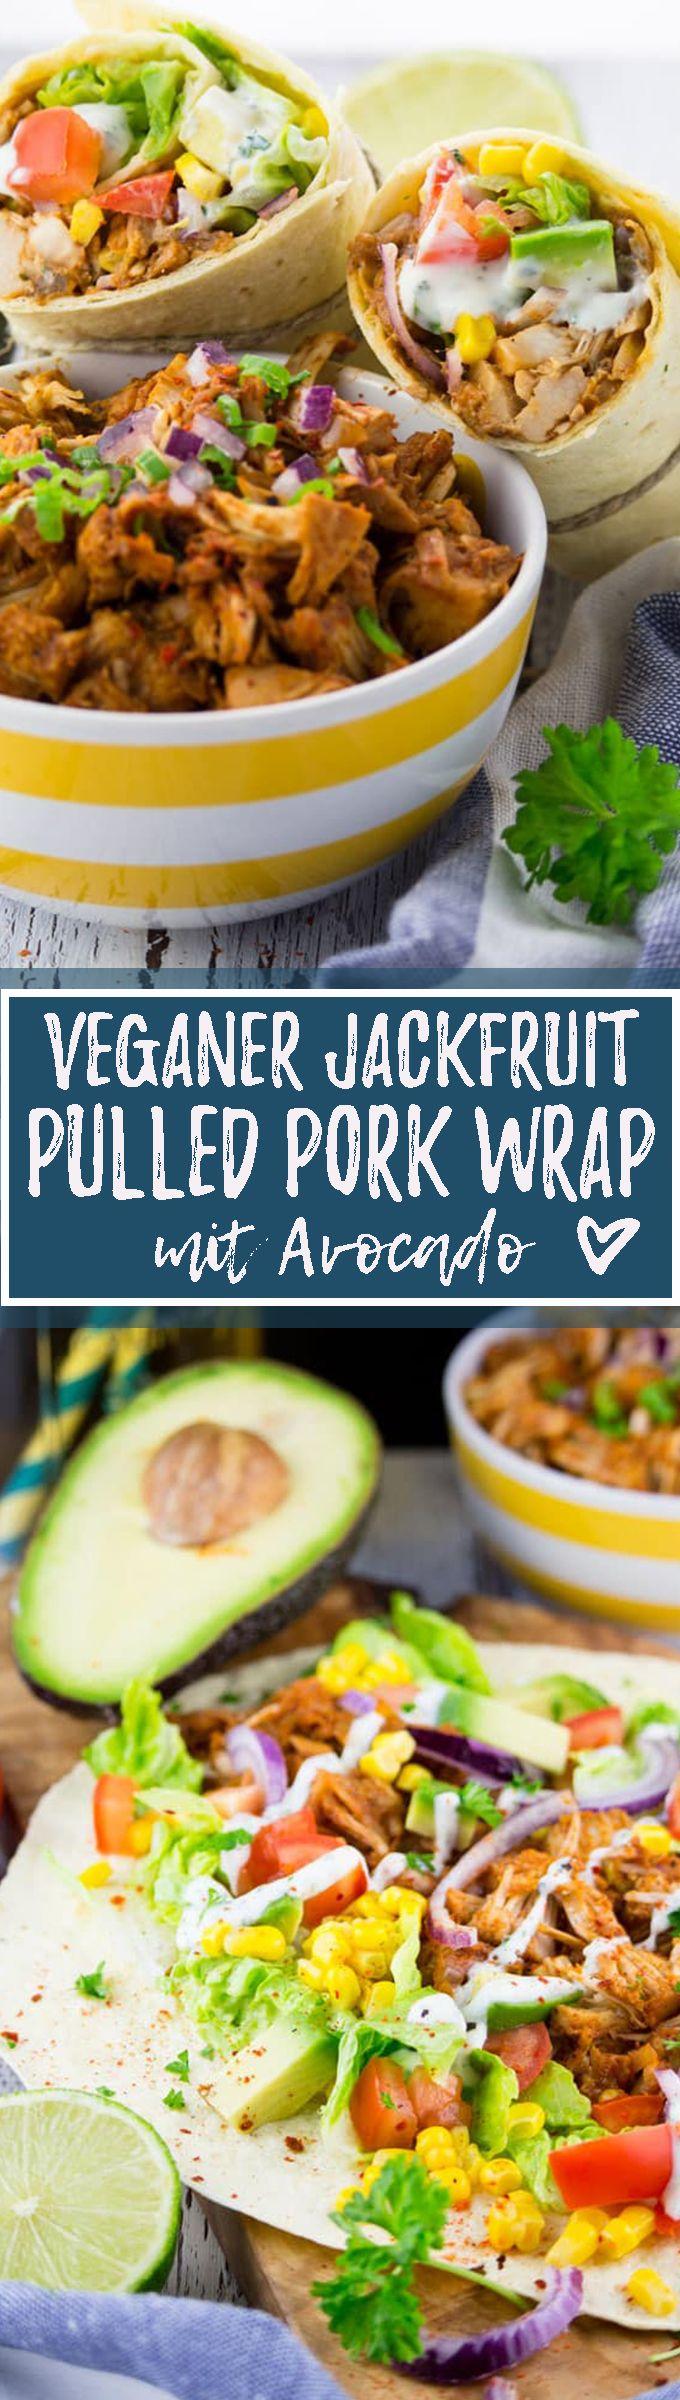 Photo of Veganer Jackfruit Pulled Pork Wrap